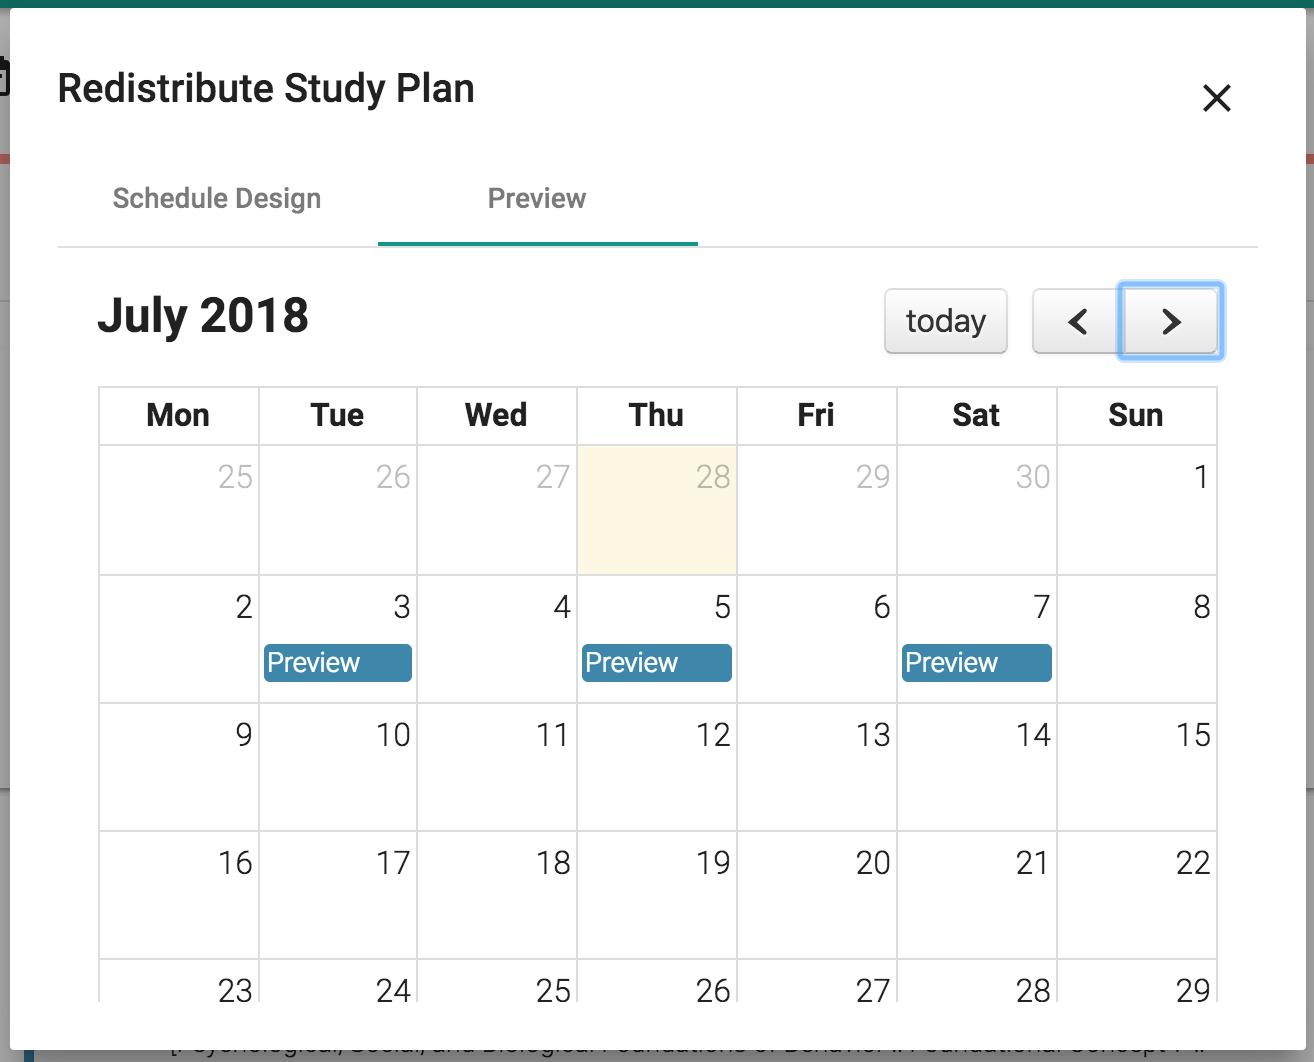 Redistribute study plan dialog